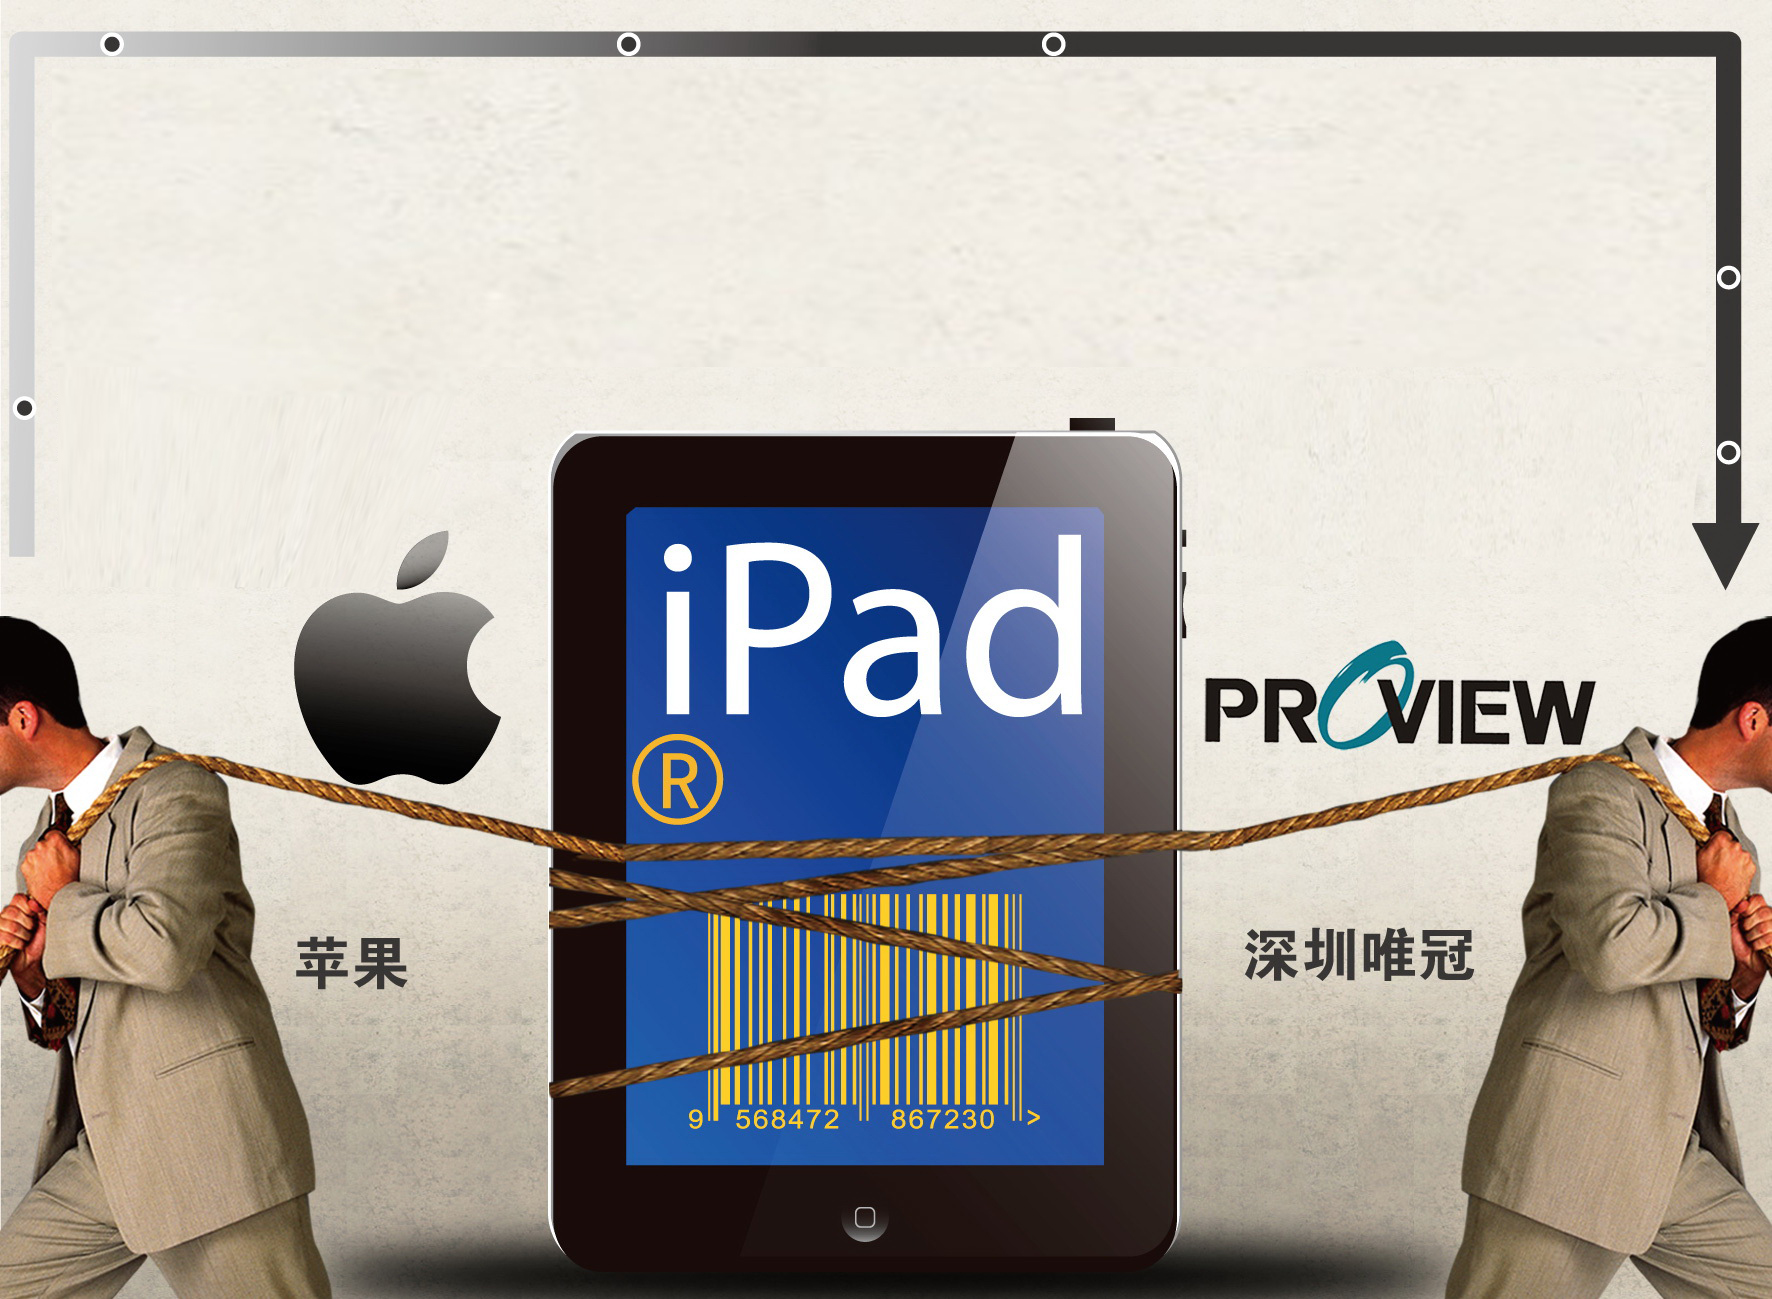 iPad-Proview-Apple-photo